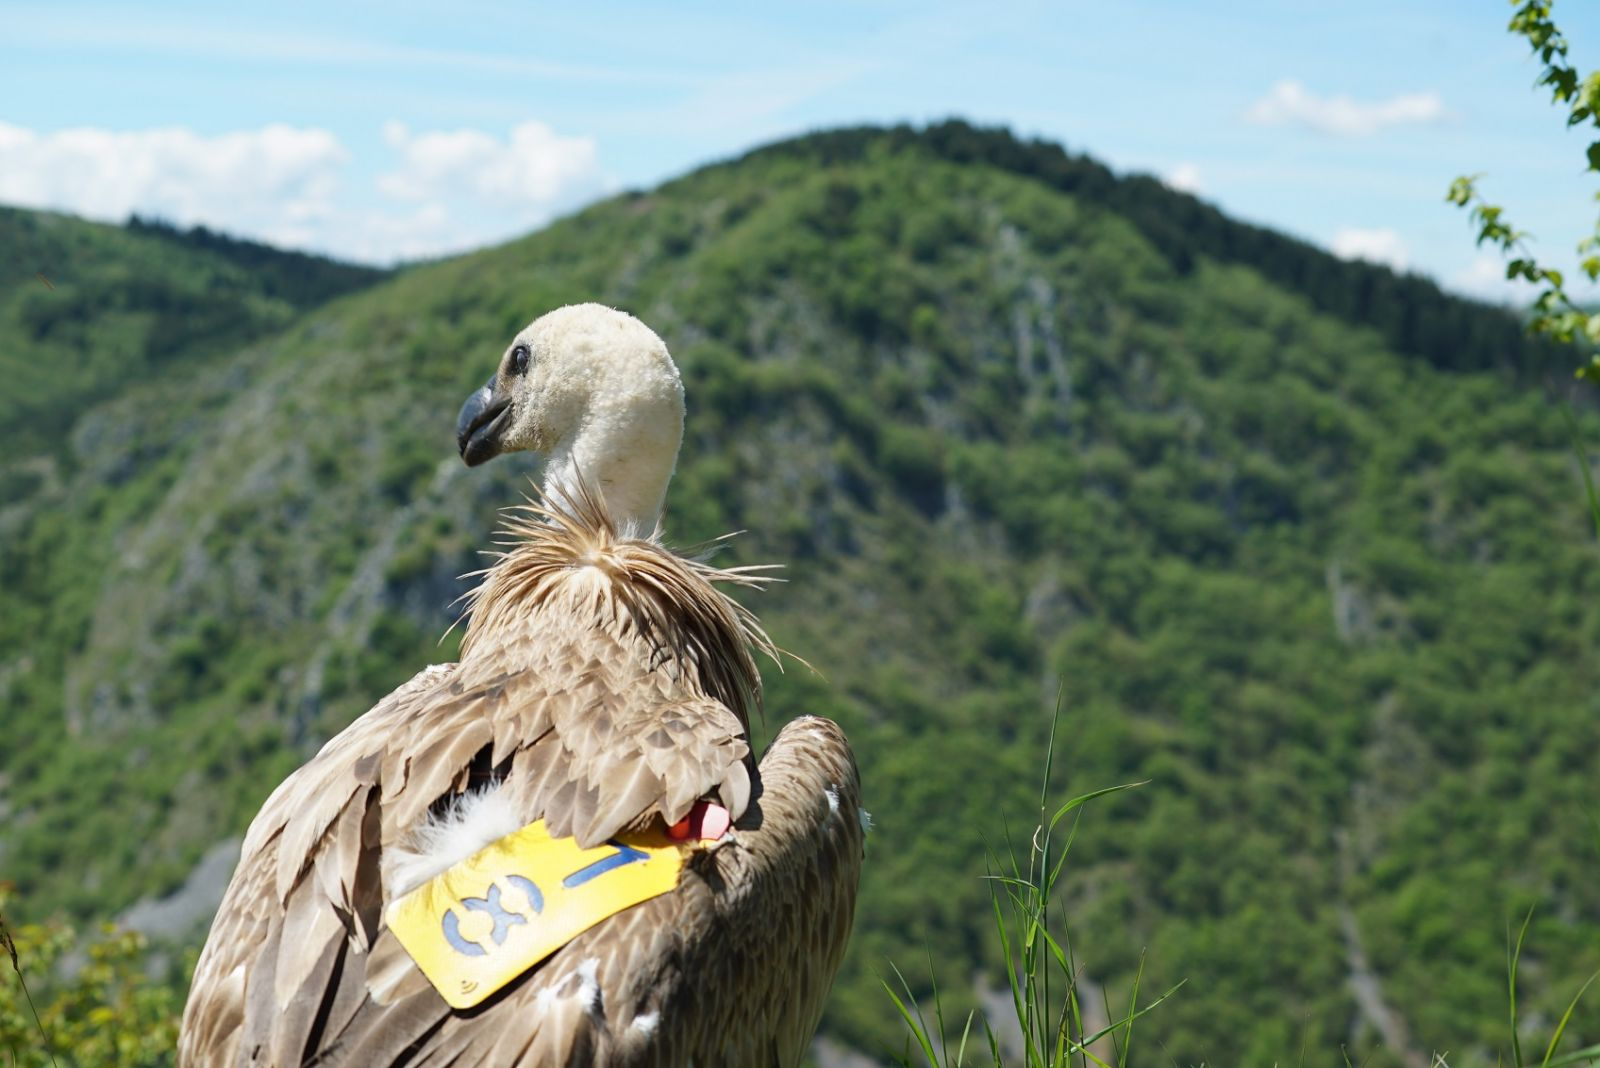 Turkish Cargo върна у дома застрашен лешояд